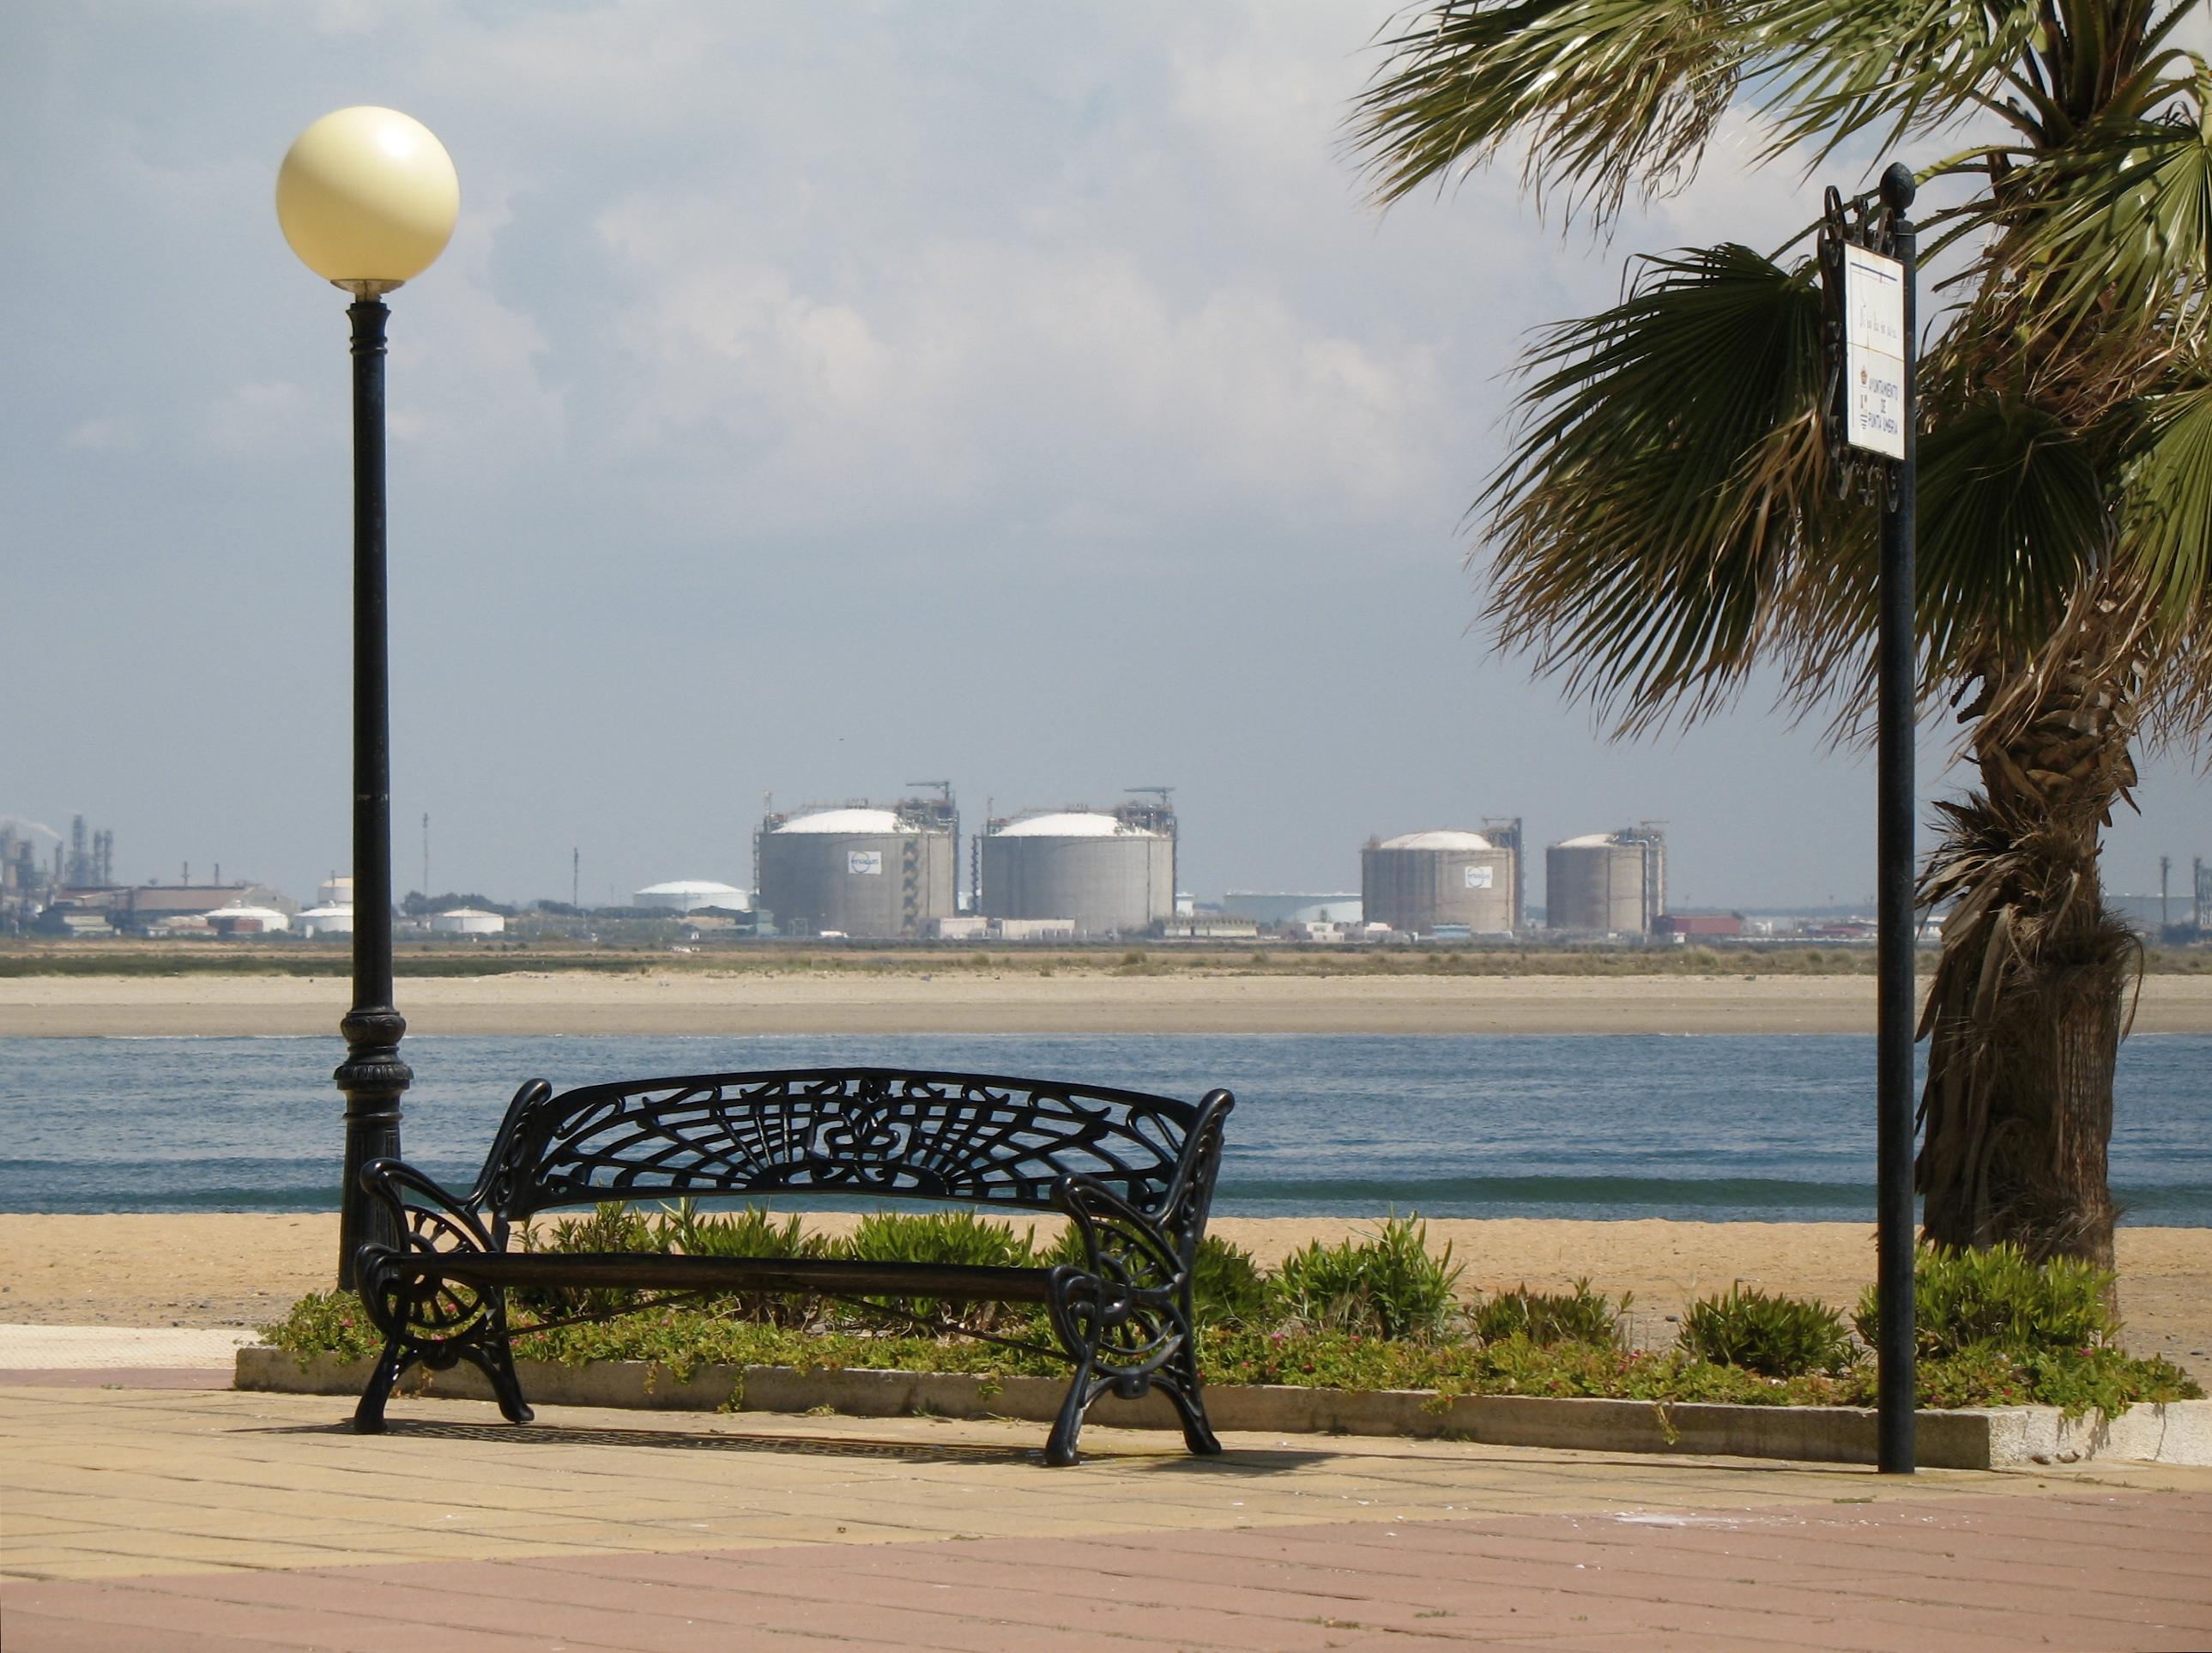 File:Punta Umbría 001.jpg - Wikimedia Commons